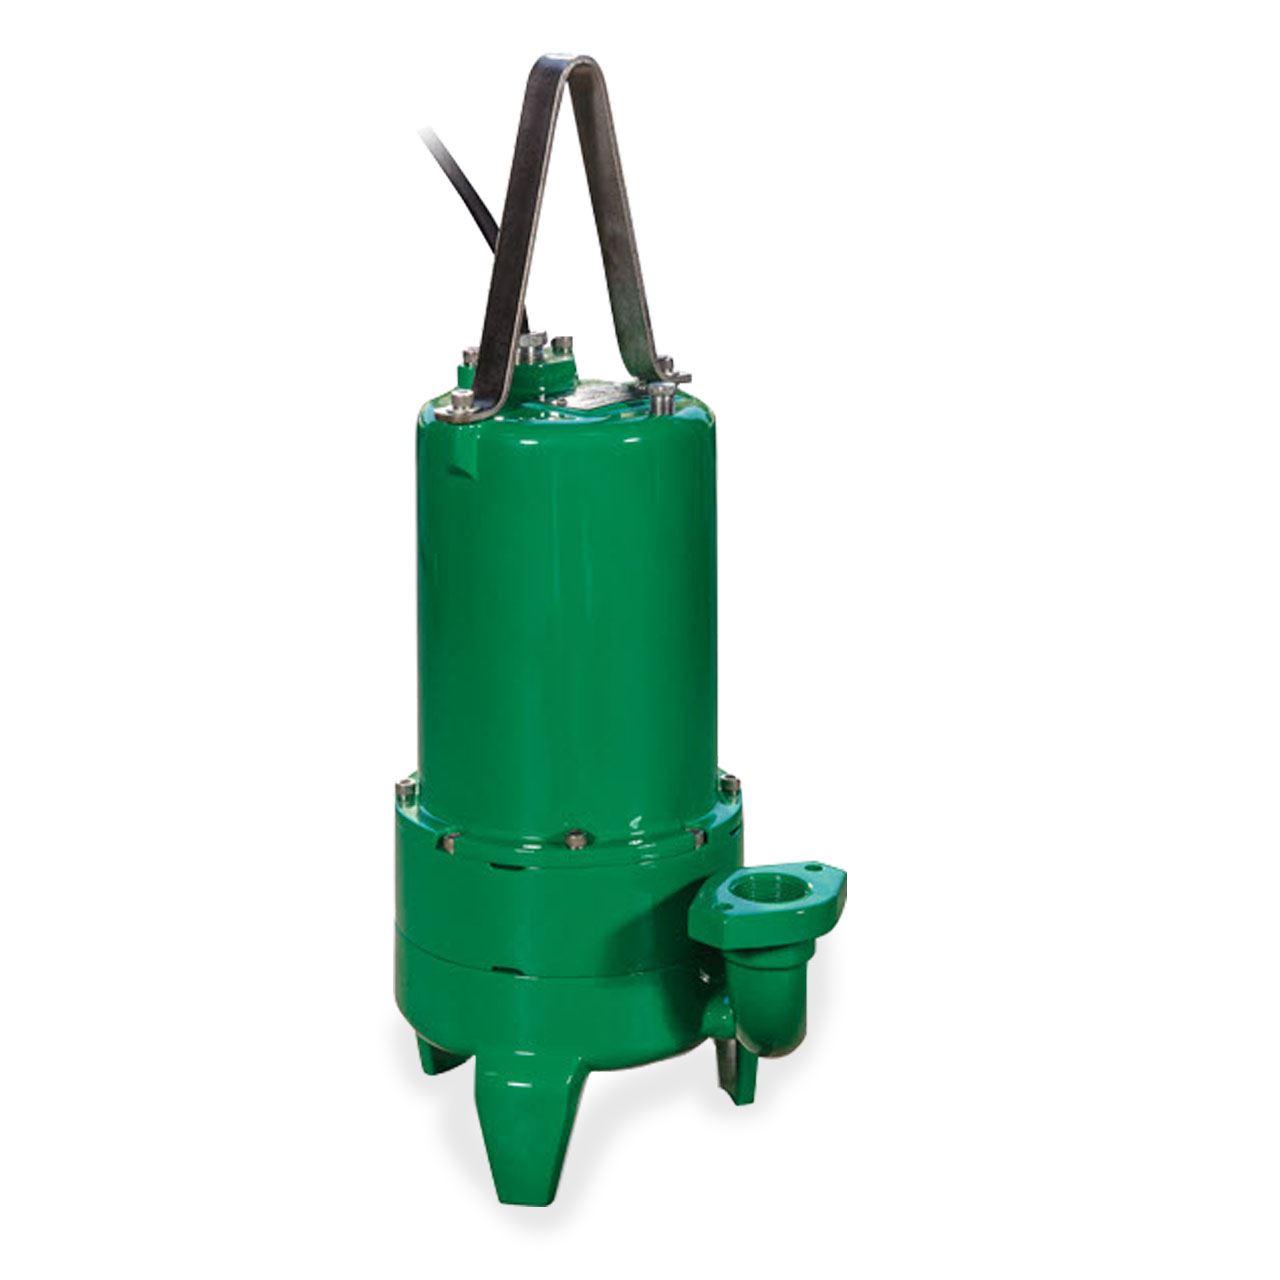 myers myers vrs20a 21 vr2 residential submersible grinder pump 2 0 grinder pump control panel myers grinder pump wiring diagram [ 1280 x 1280 Pixel ]